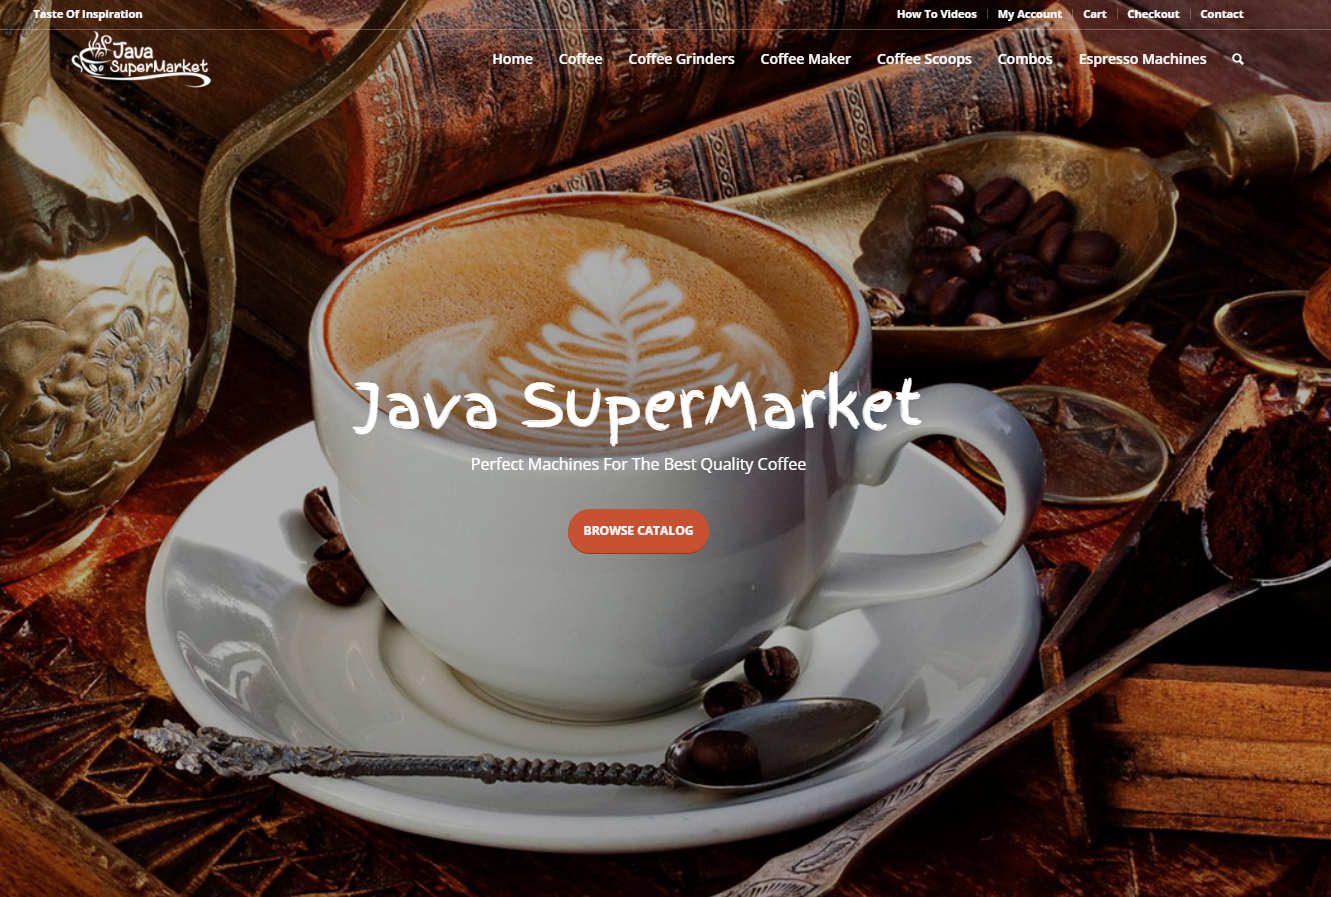 JavaSupermarket.com